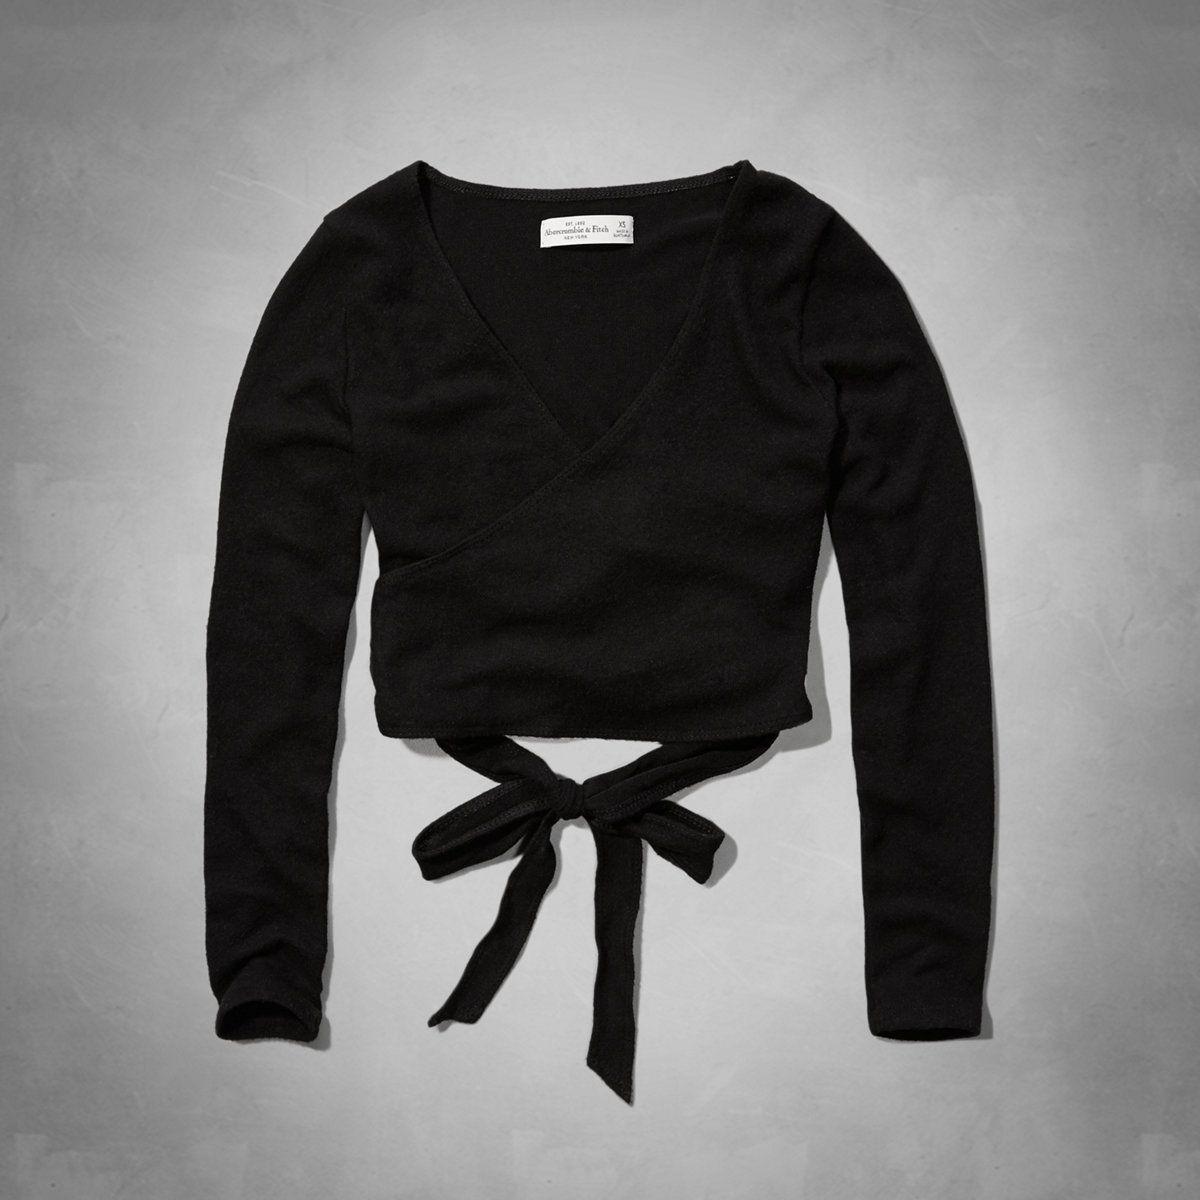 abercrombie black shirt